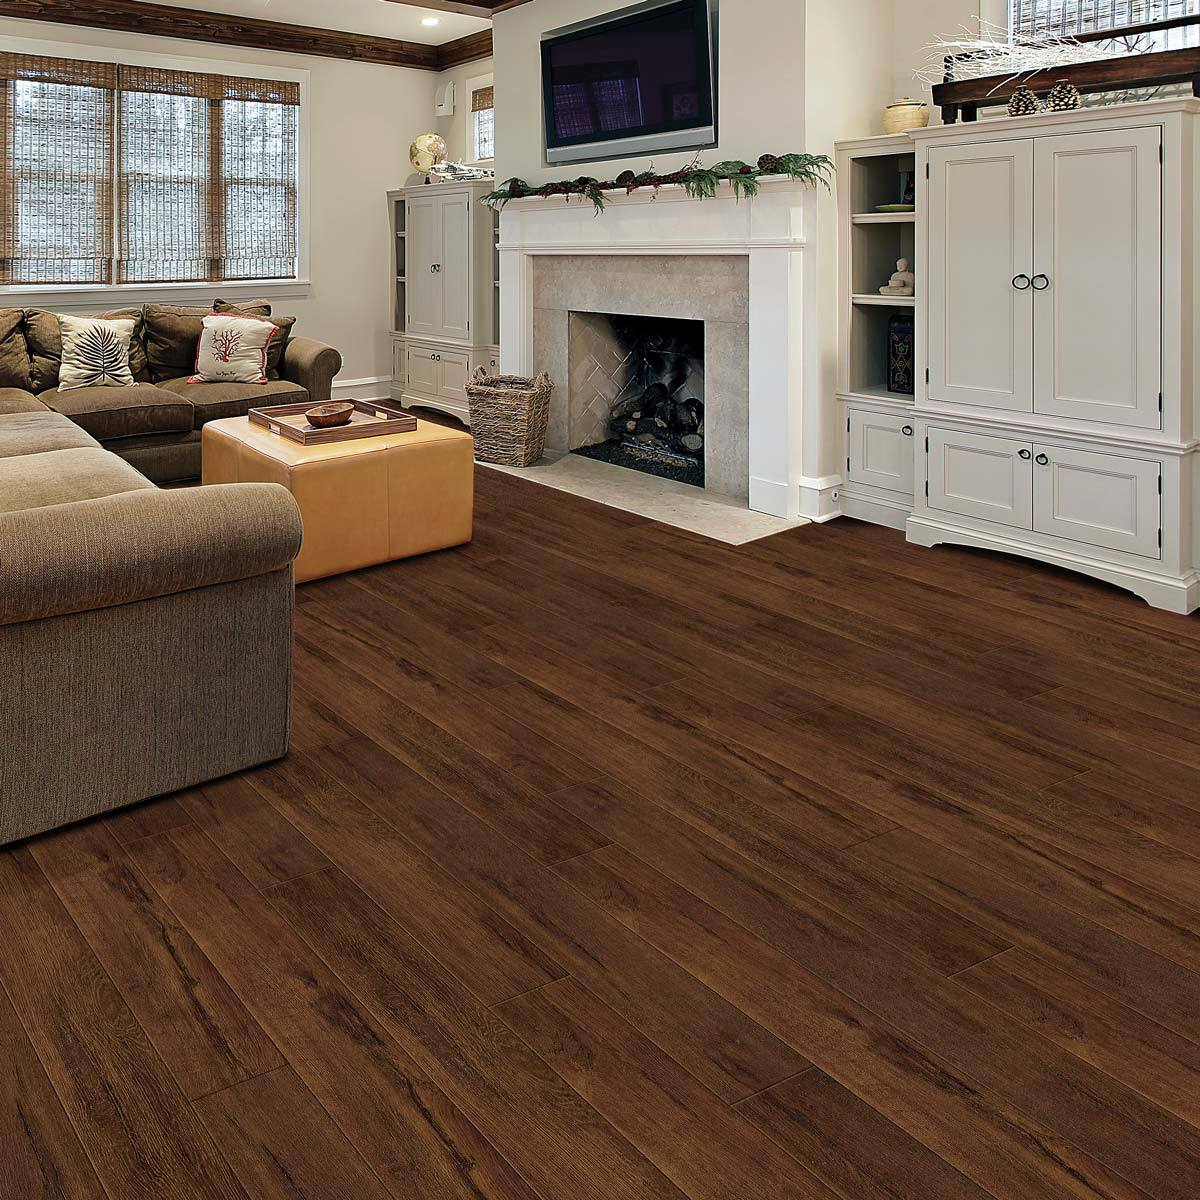 Golden Select Highland Brown Oak, Costco Laminate Flooring Installation Cost